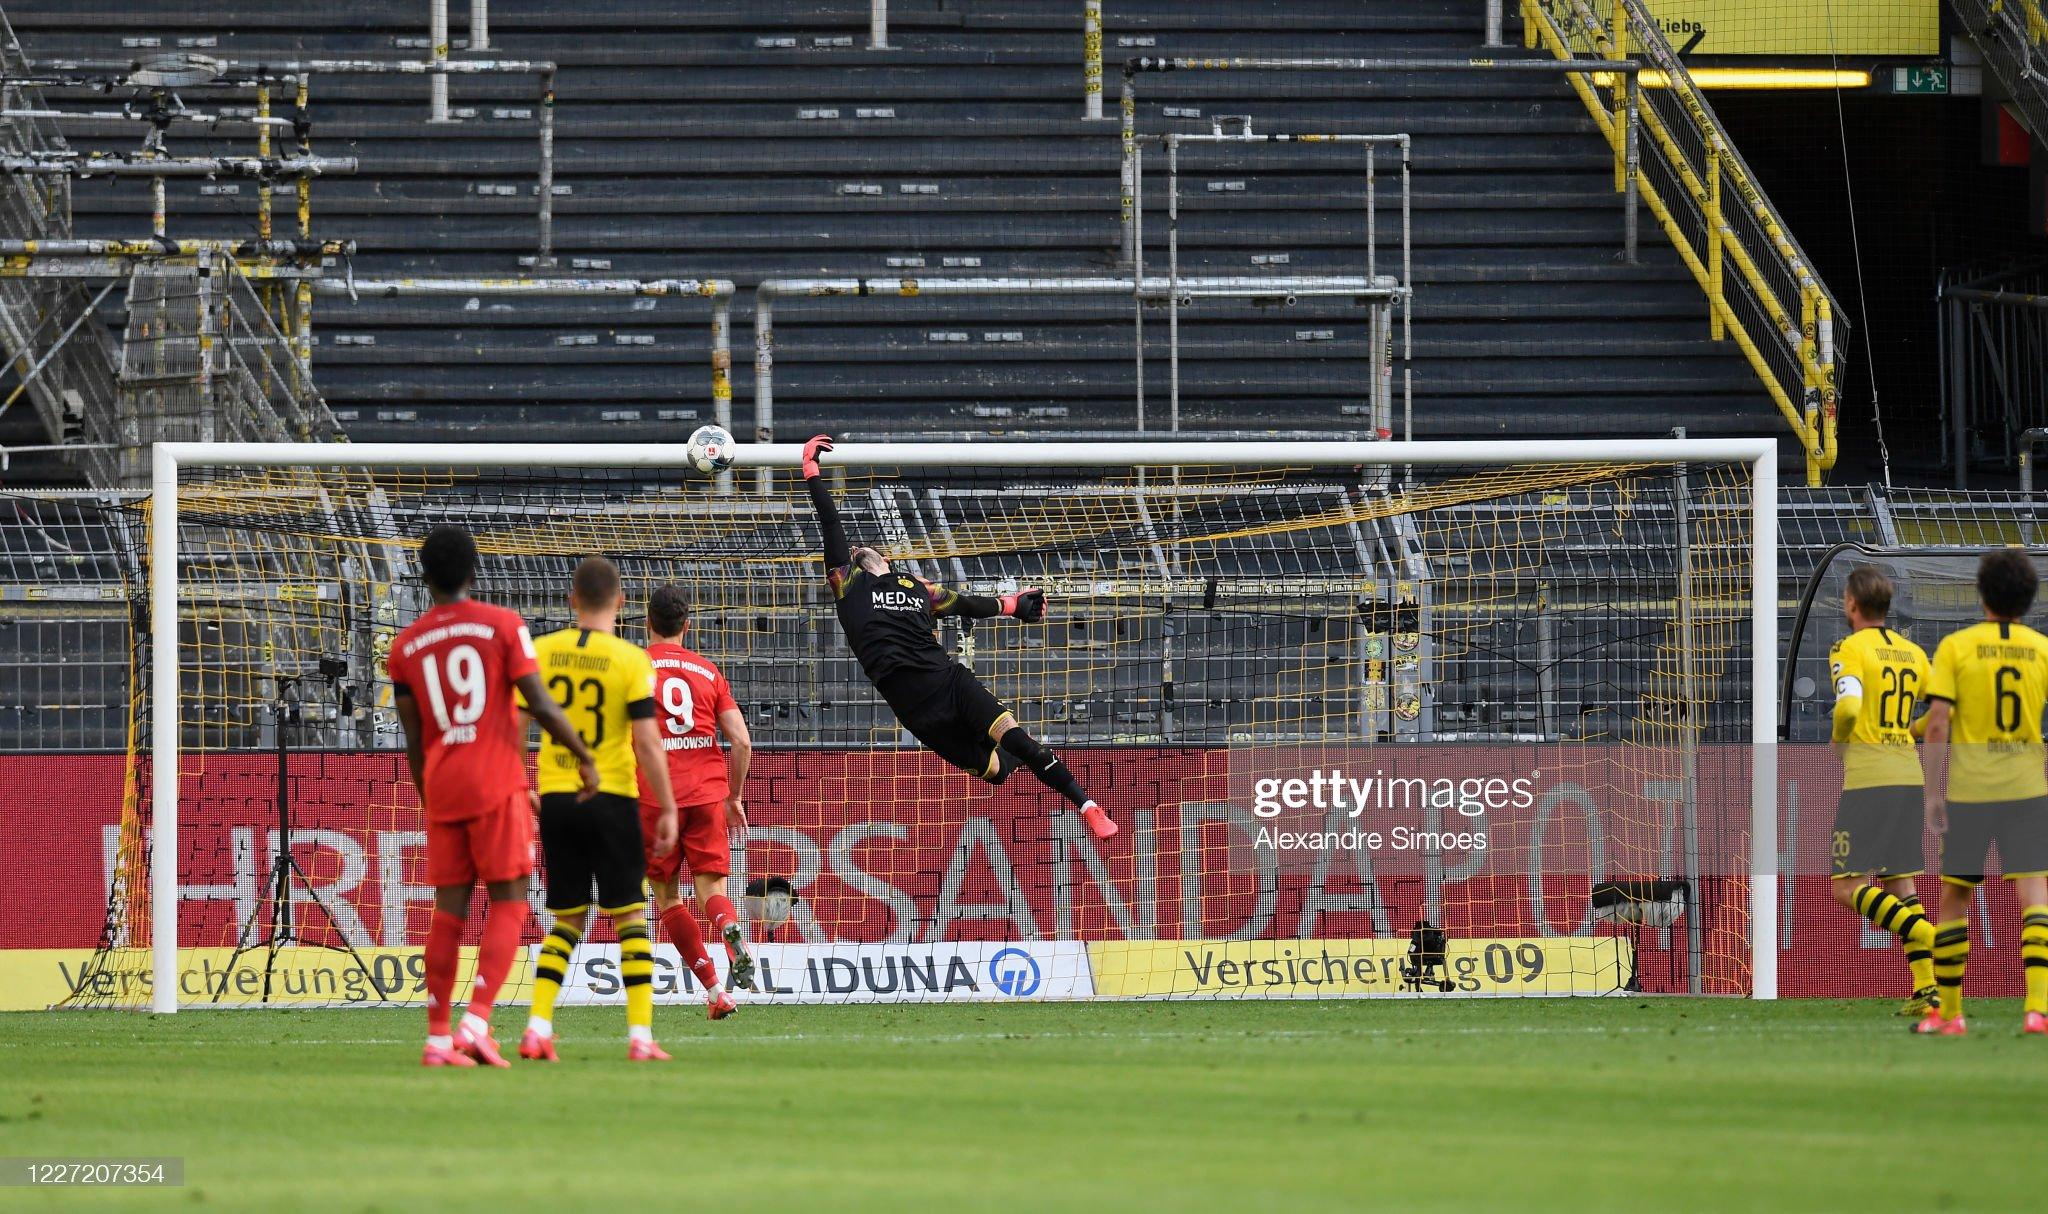 Borussia Dortmund v FC Bayern Muenchen - Bundesliga : Fotografia de notícias